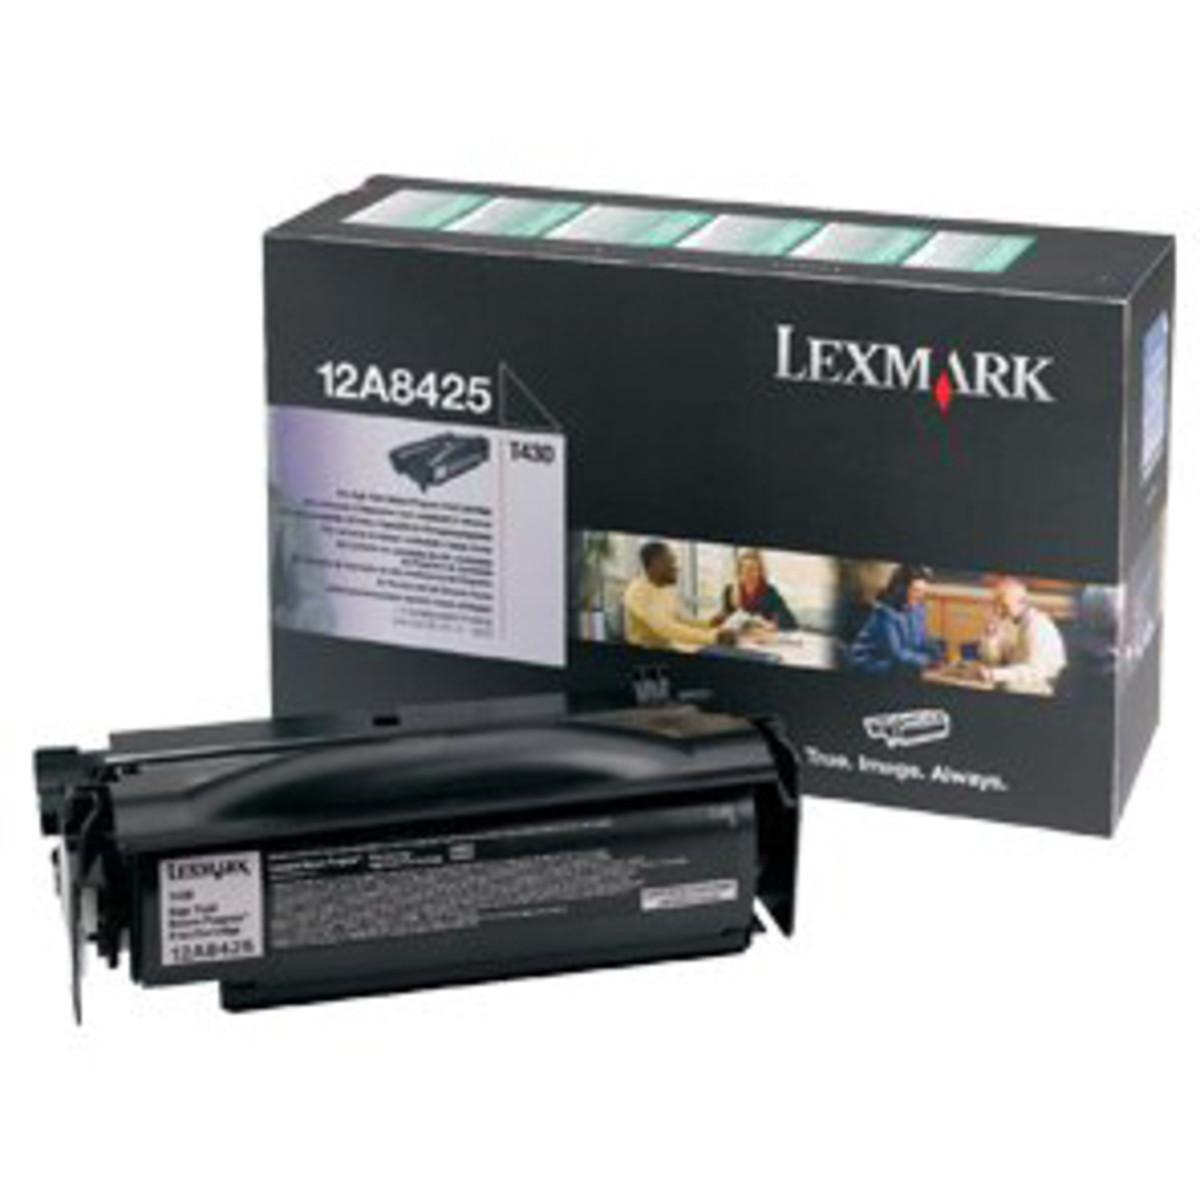 Lexmark 12A8425 Black Toner Cartridge - High Yield